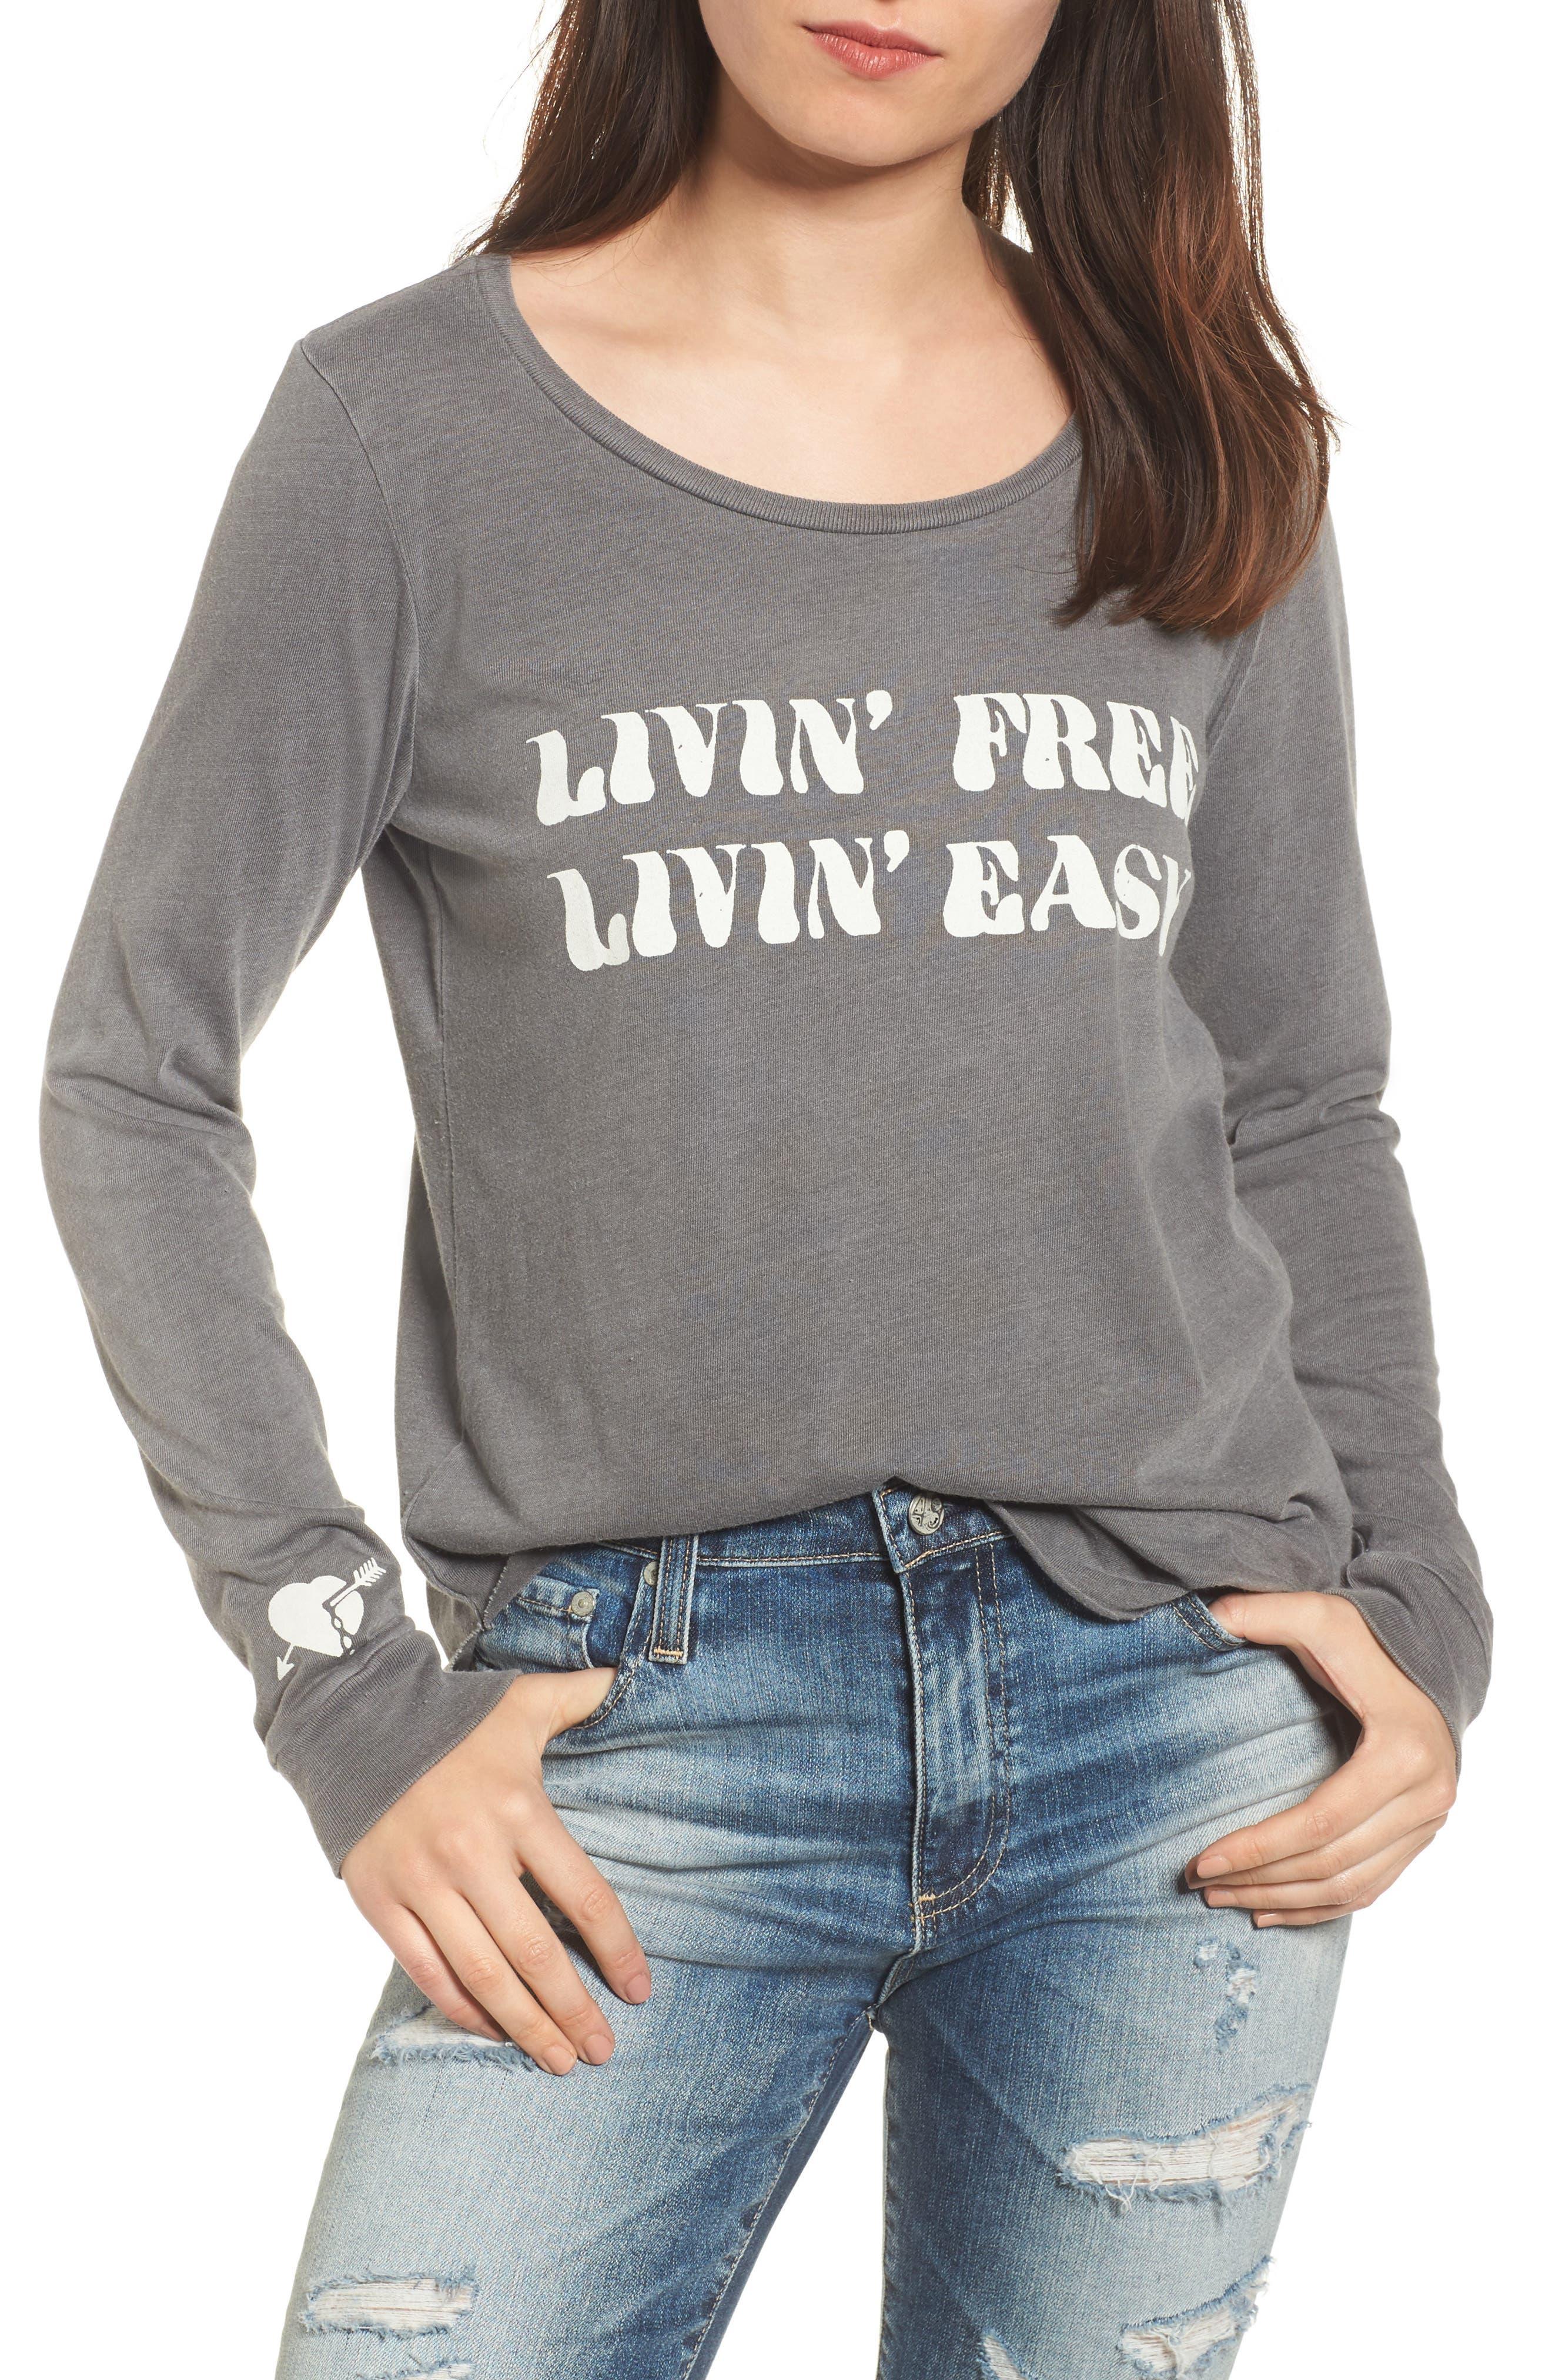 Livin' Free Livin' Easy Top,                             Main thumbnail 1, color,                             088